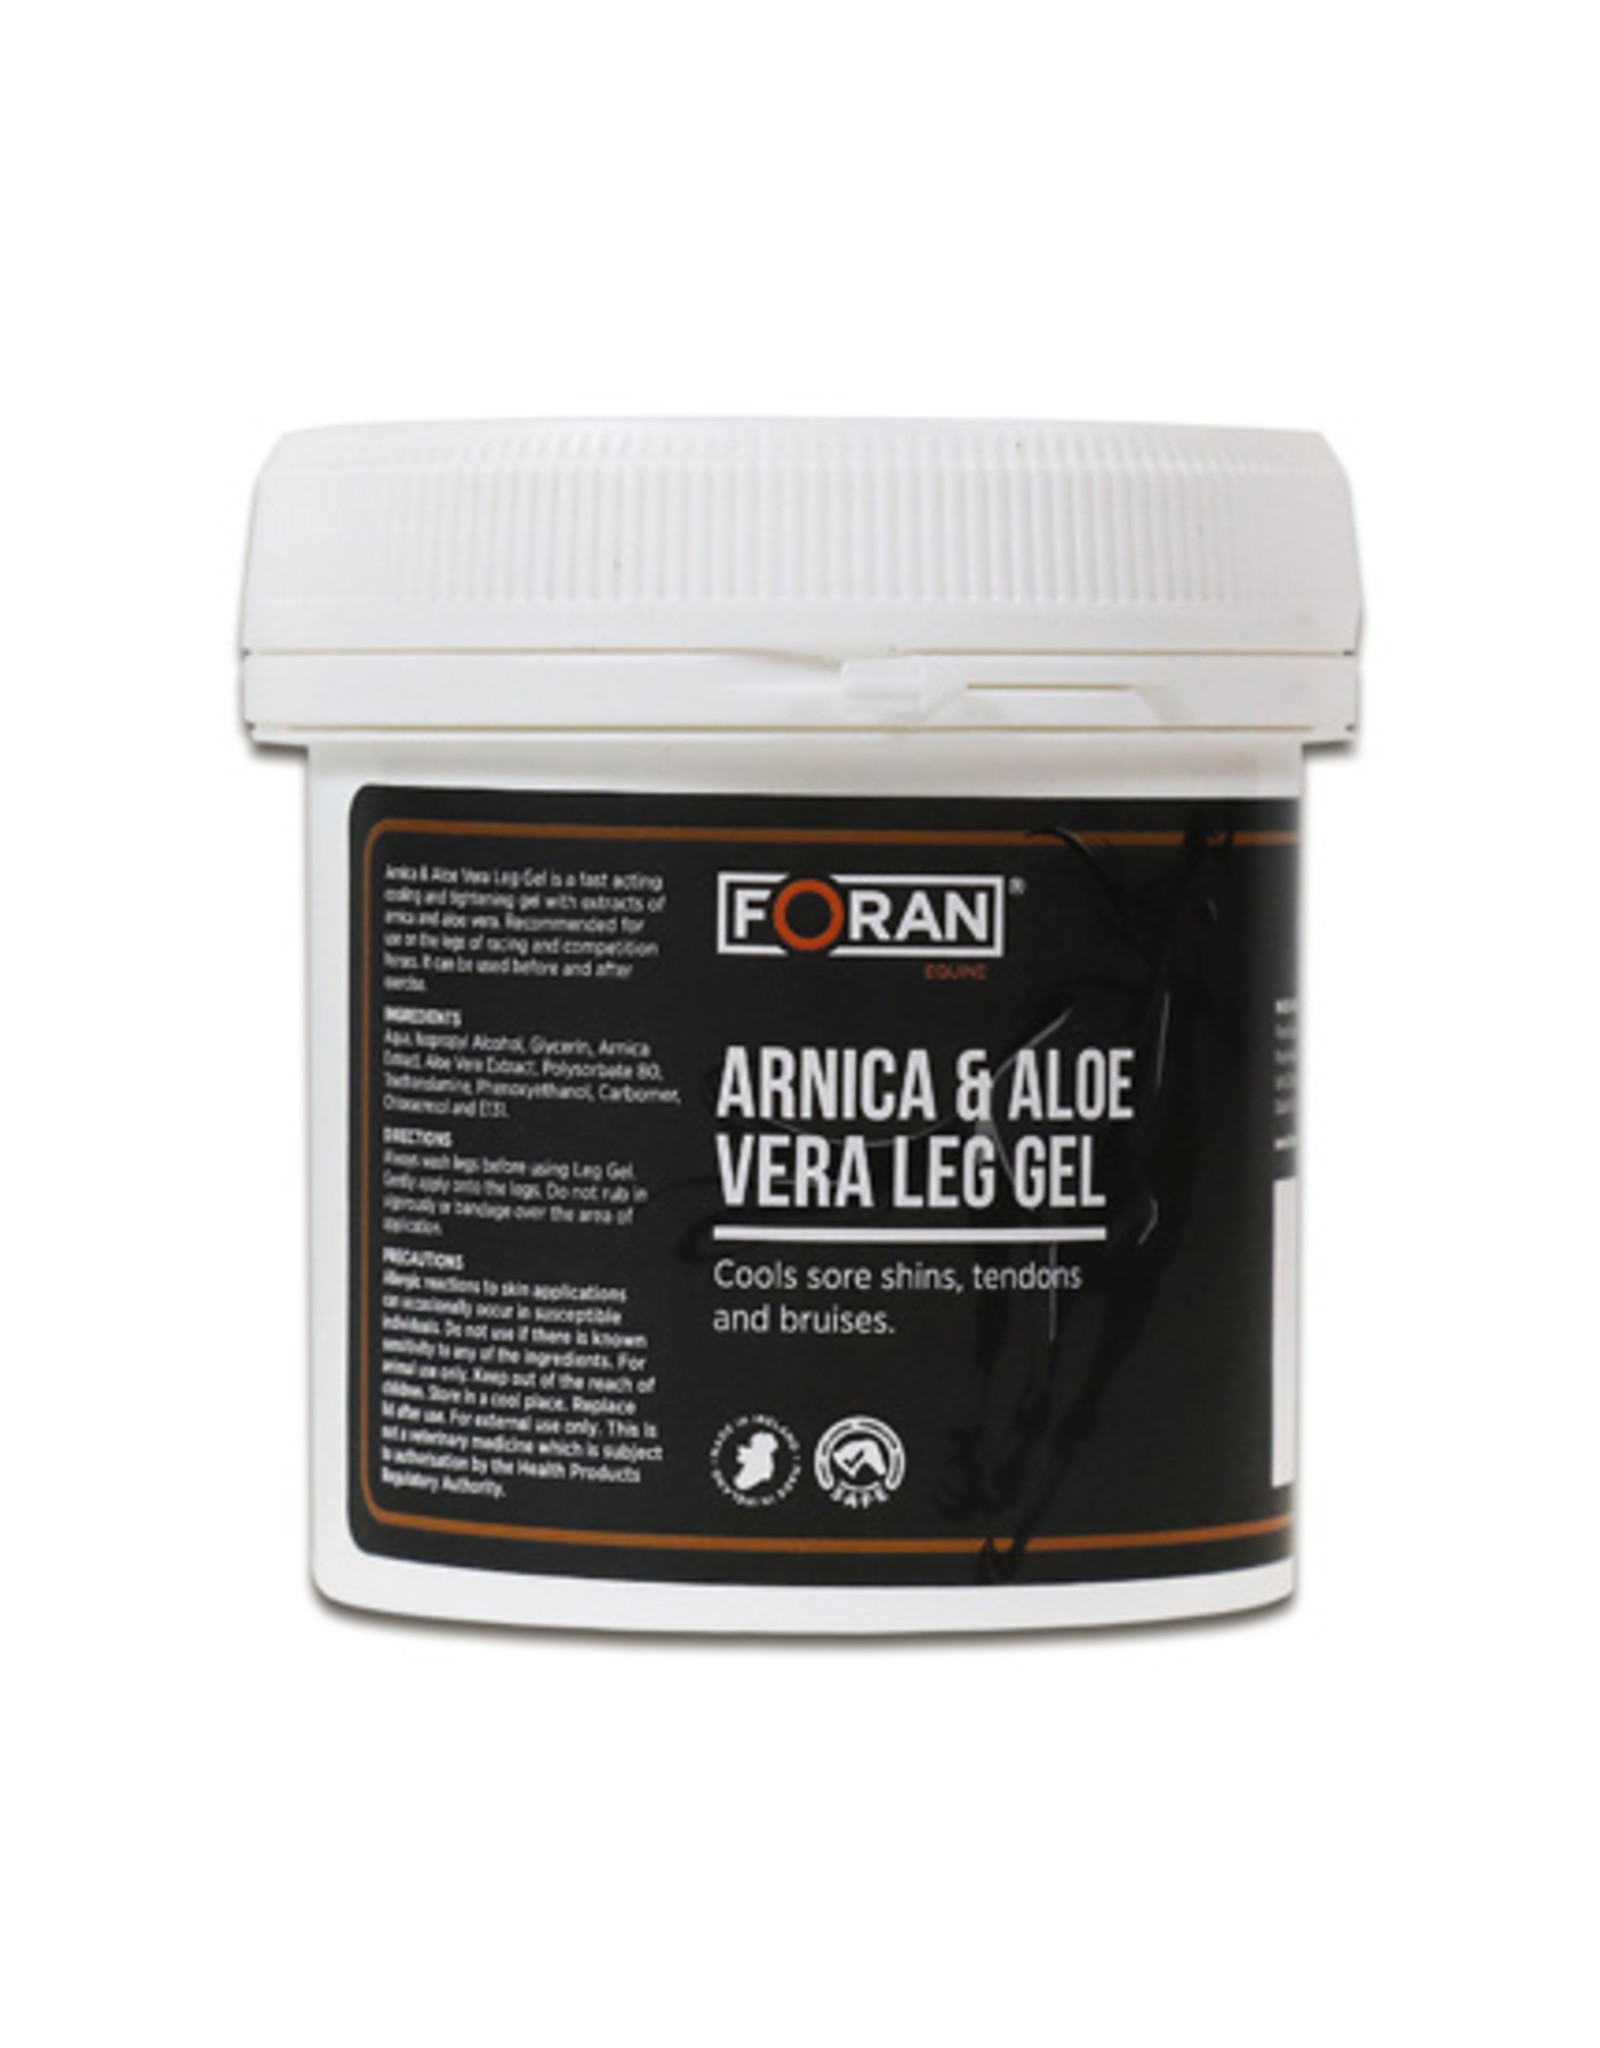 Foran Arnica & Aloe Vera Leg Gel